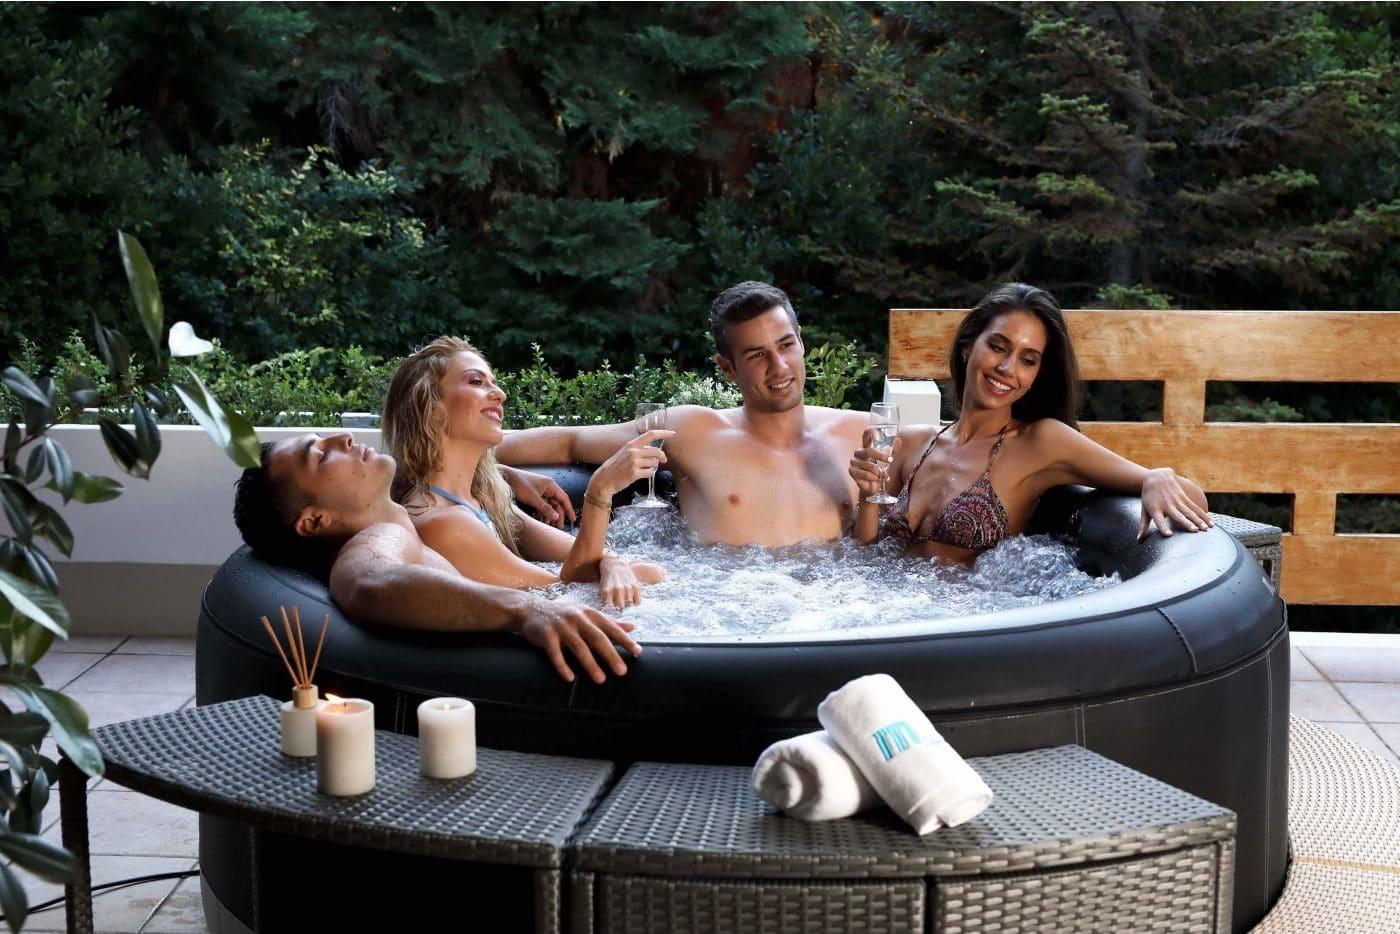 Oppustelig spadbad med plads til 6 personer